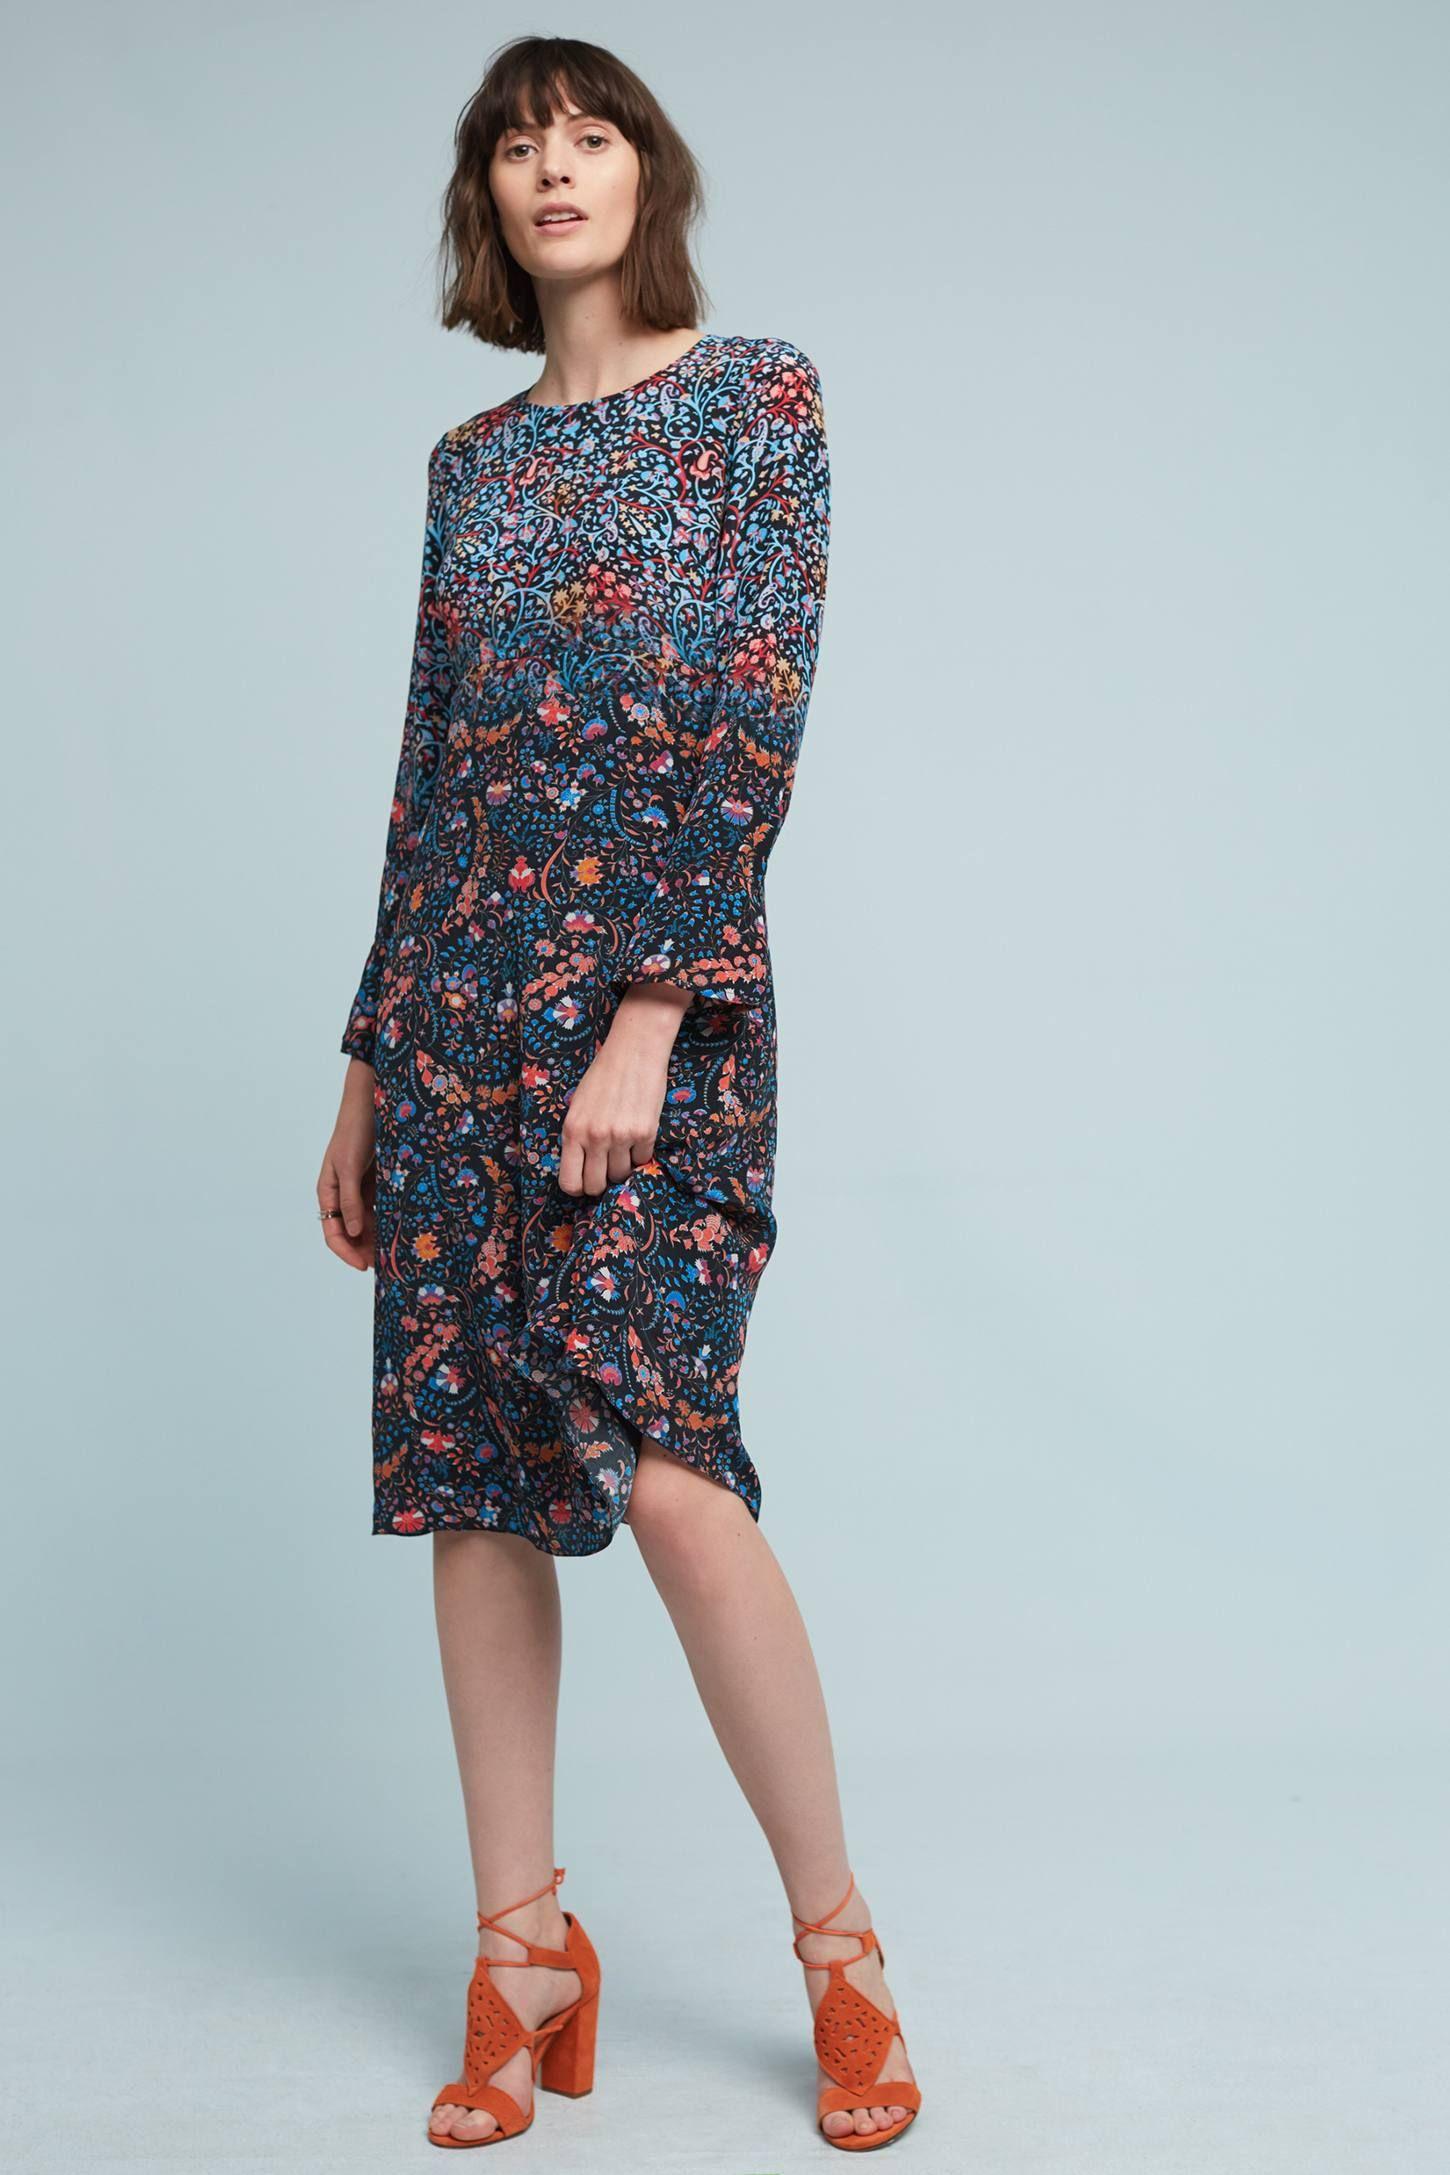 52e548307377f Summerset Silk Peasant Dress | WHAT I WANT IN MY CLOSET | Fashion ...